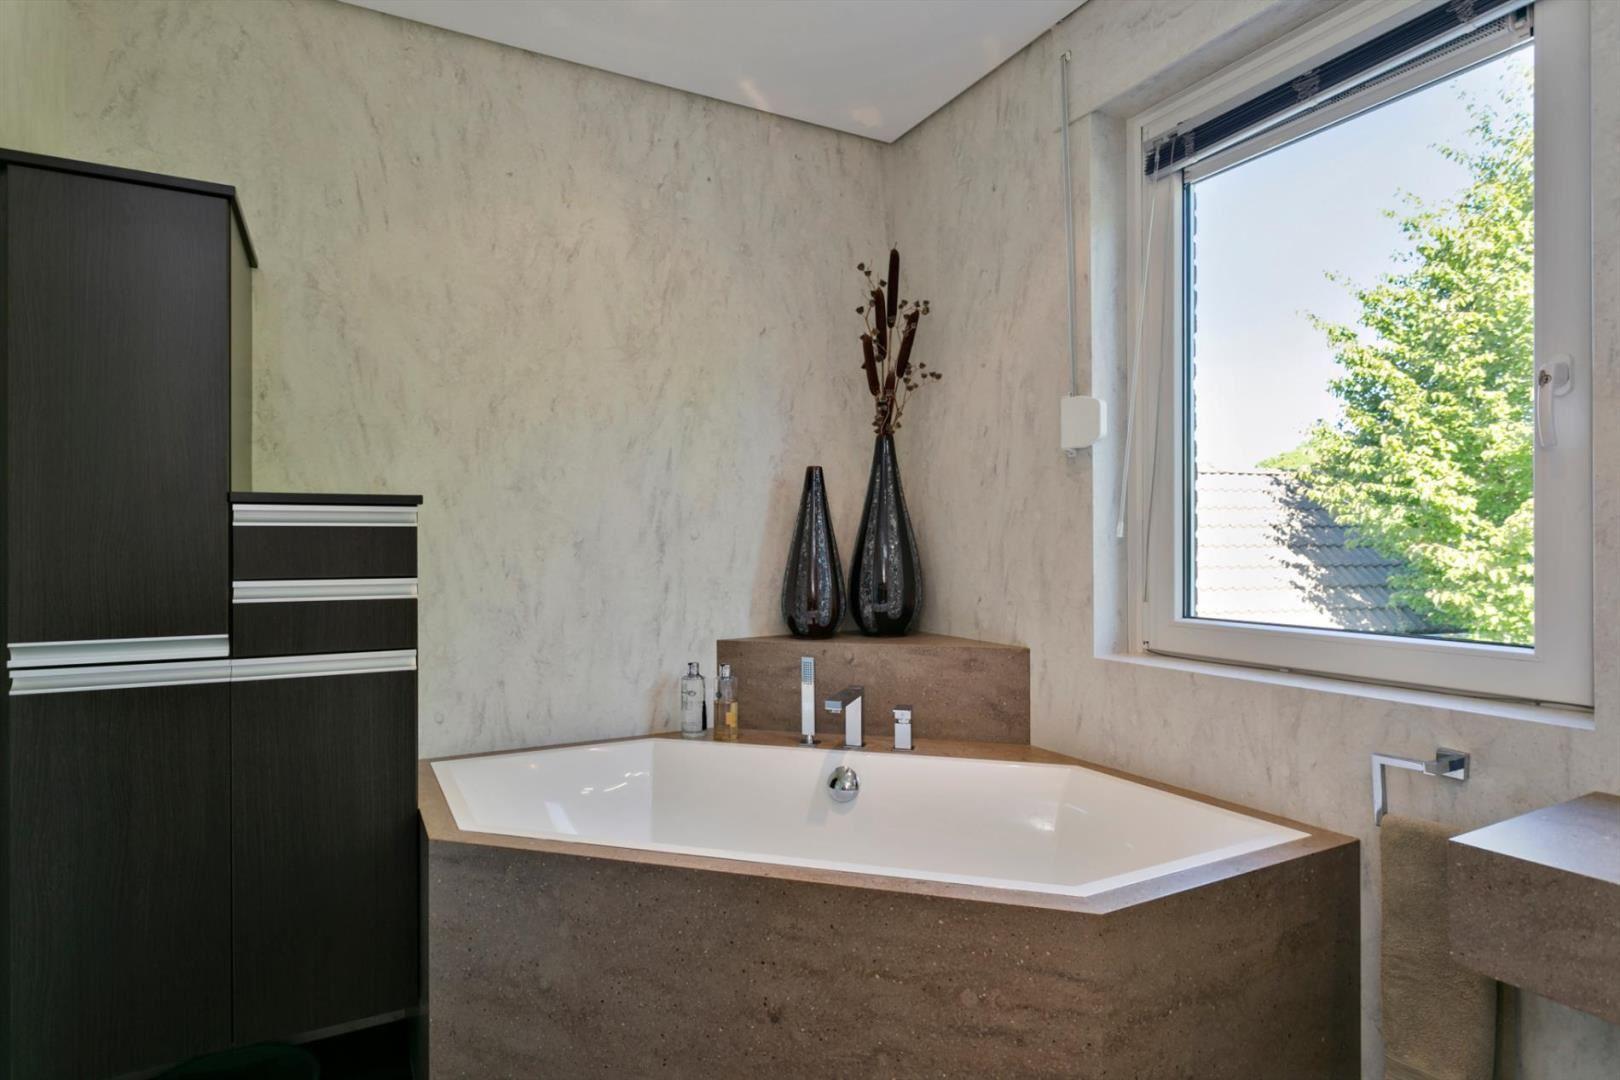 CORA Bathroomproducts - Corian badkamer - Badombouw